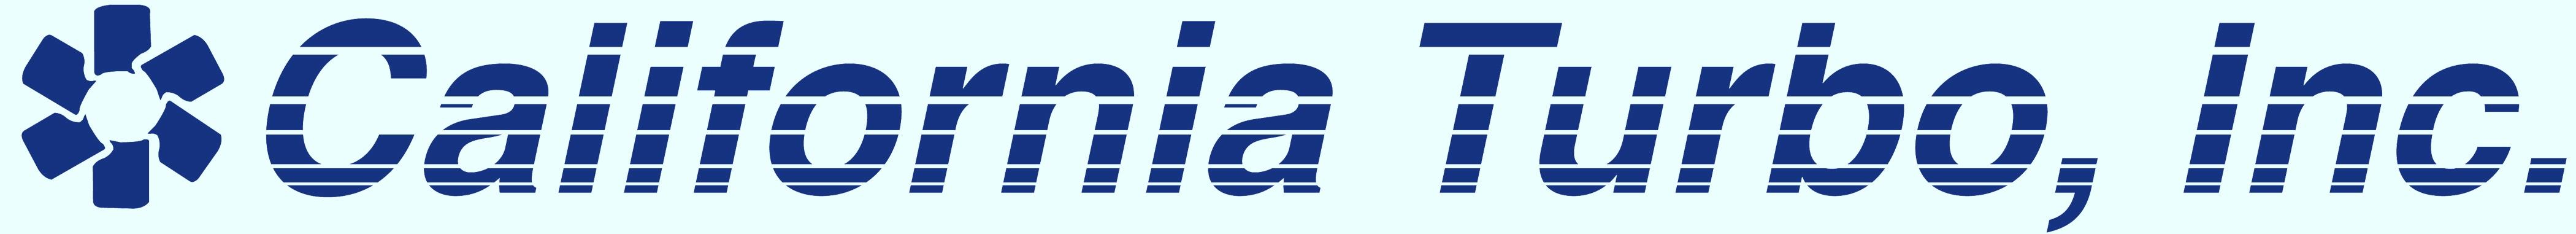 Made-in-California-manufacturer-California-Turbo-logo.jpg